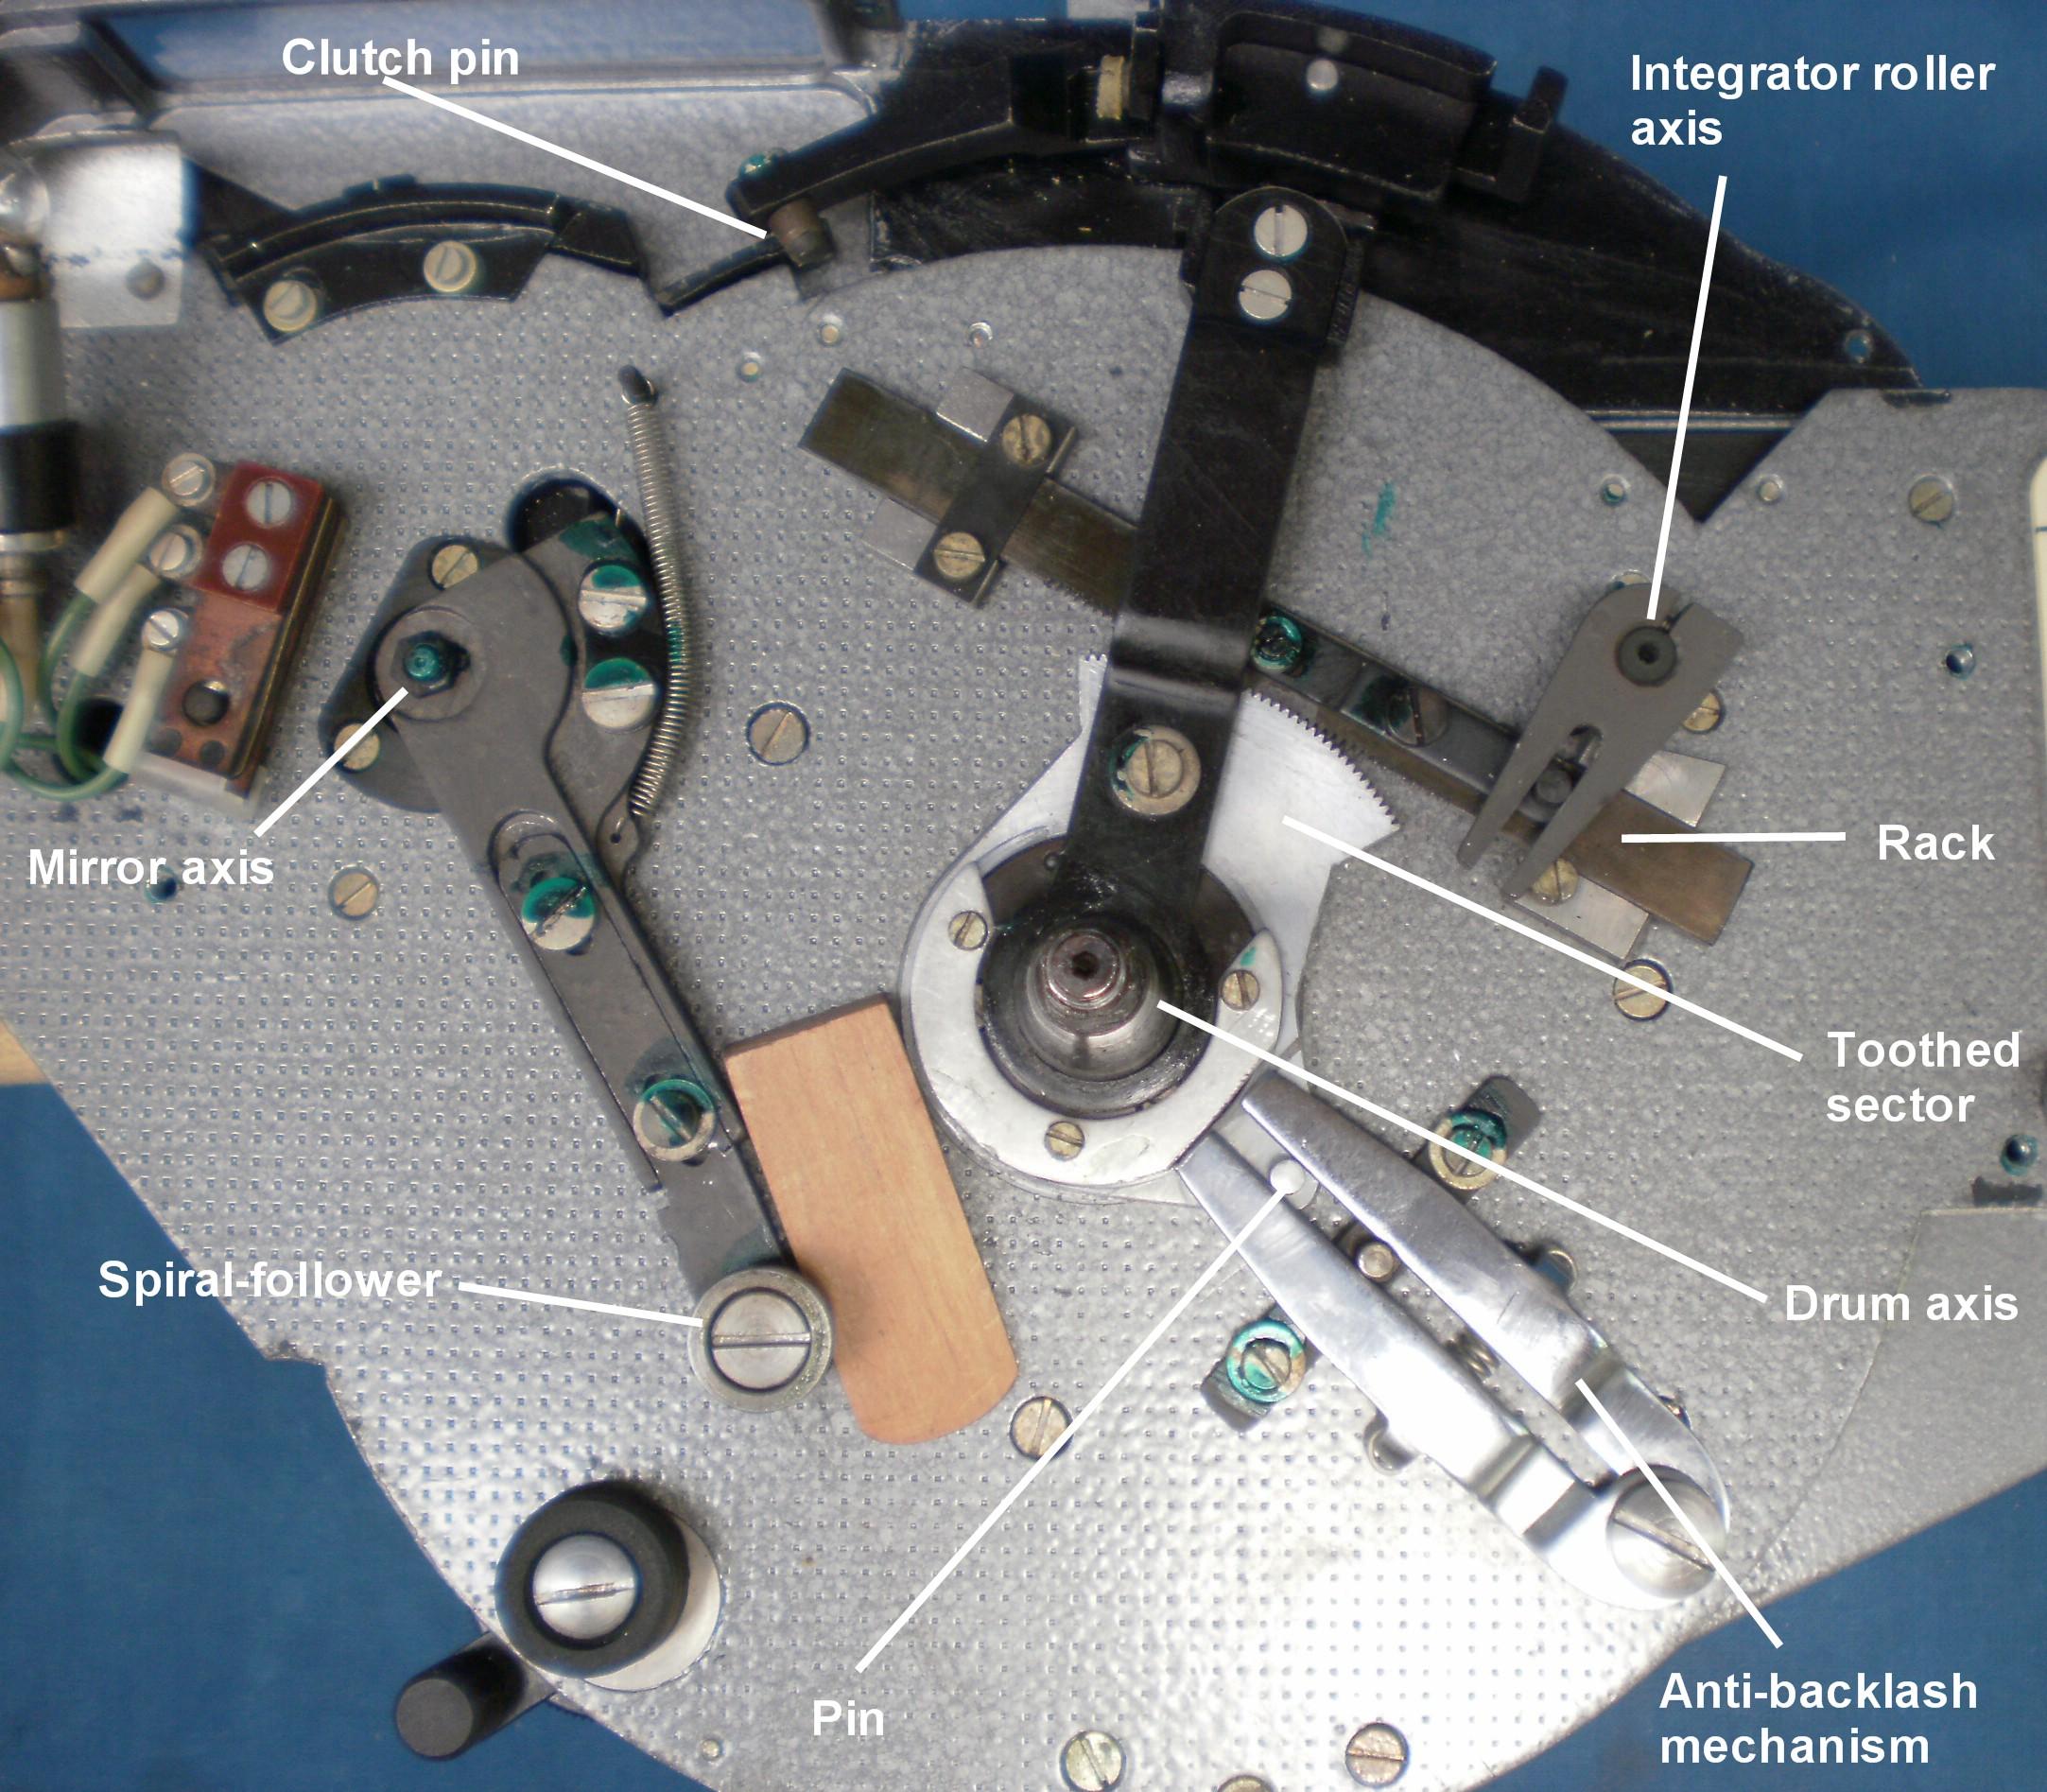 Figure 8: Controlling mechanism